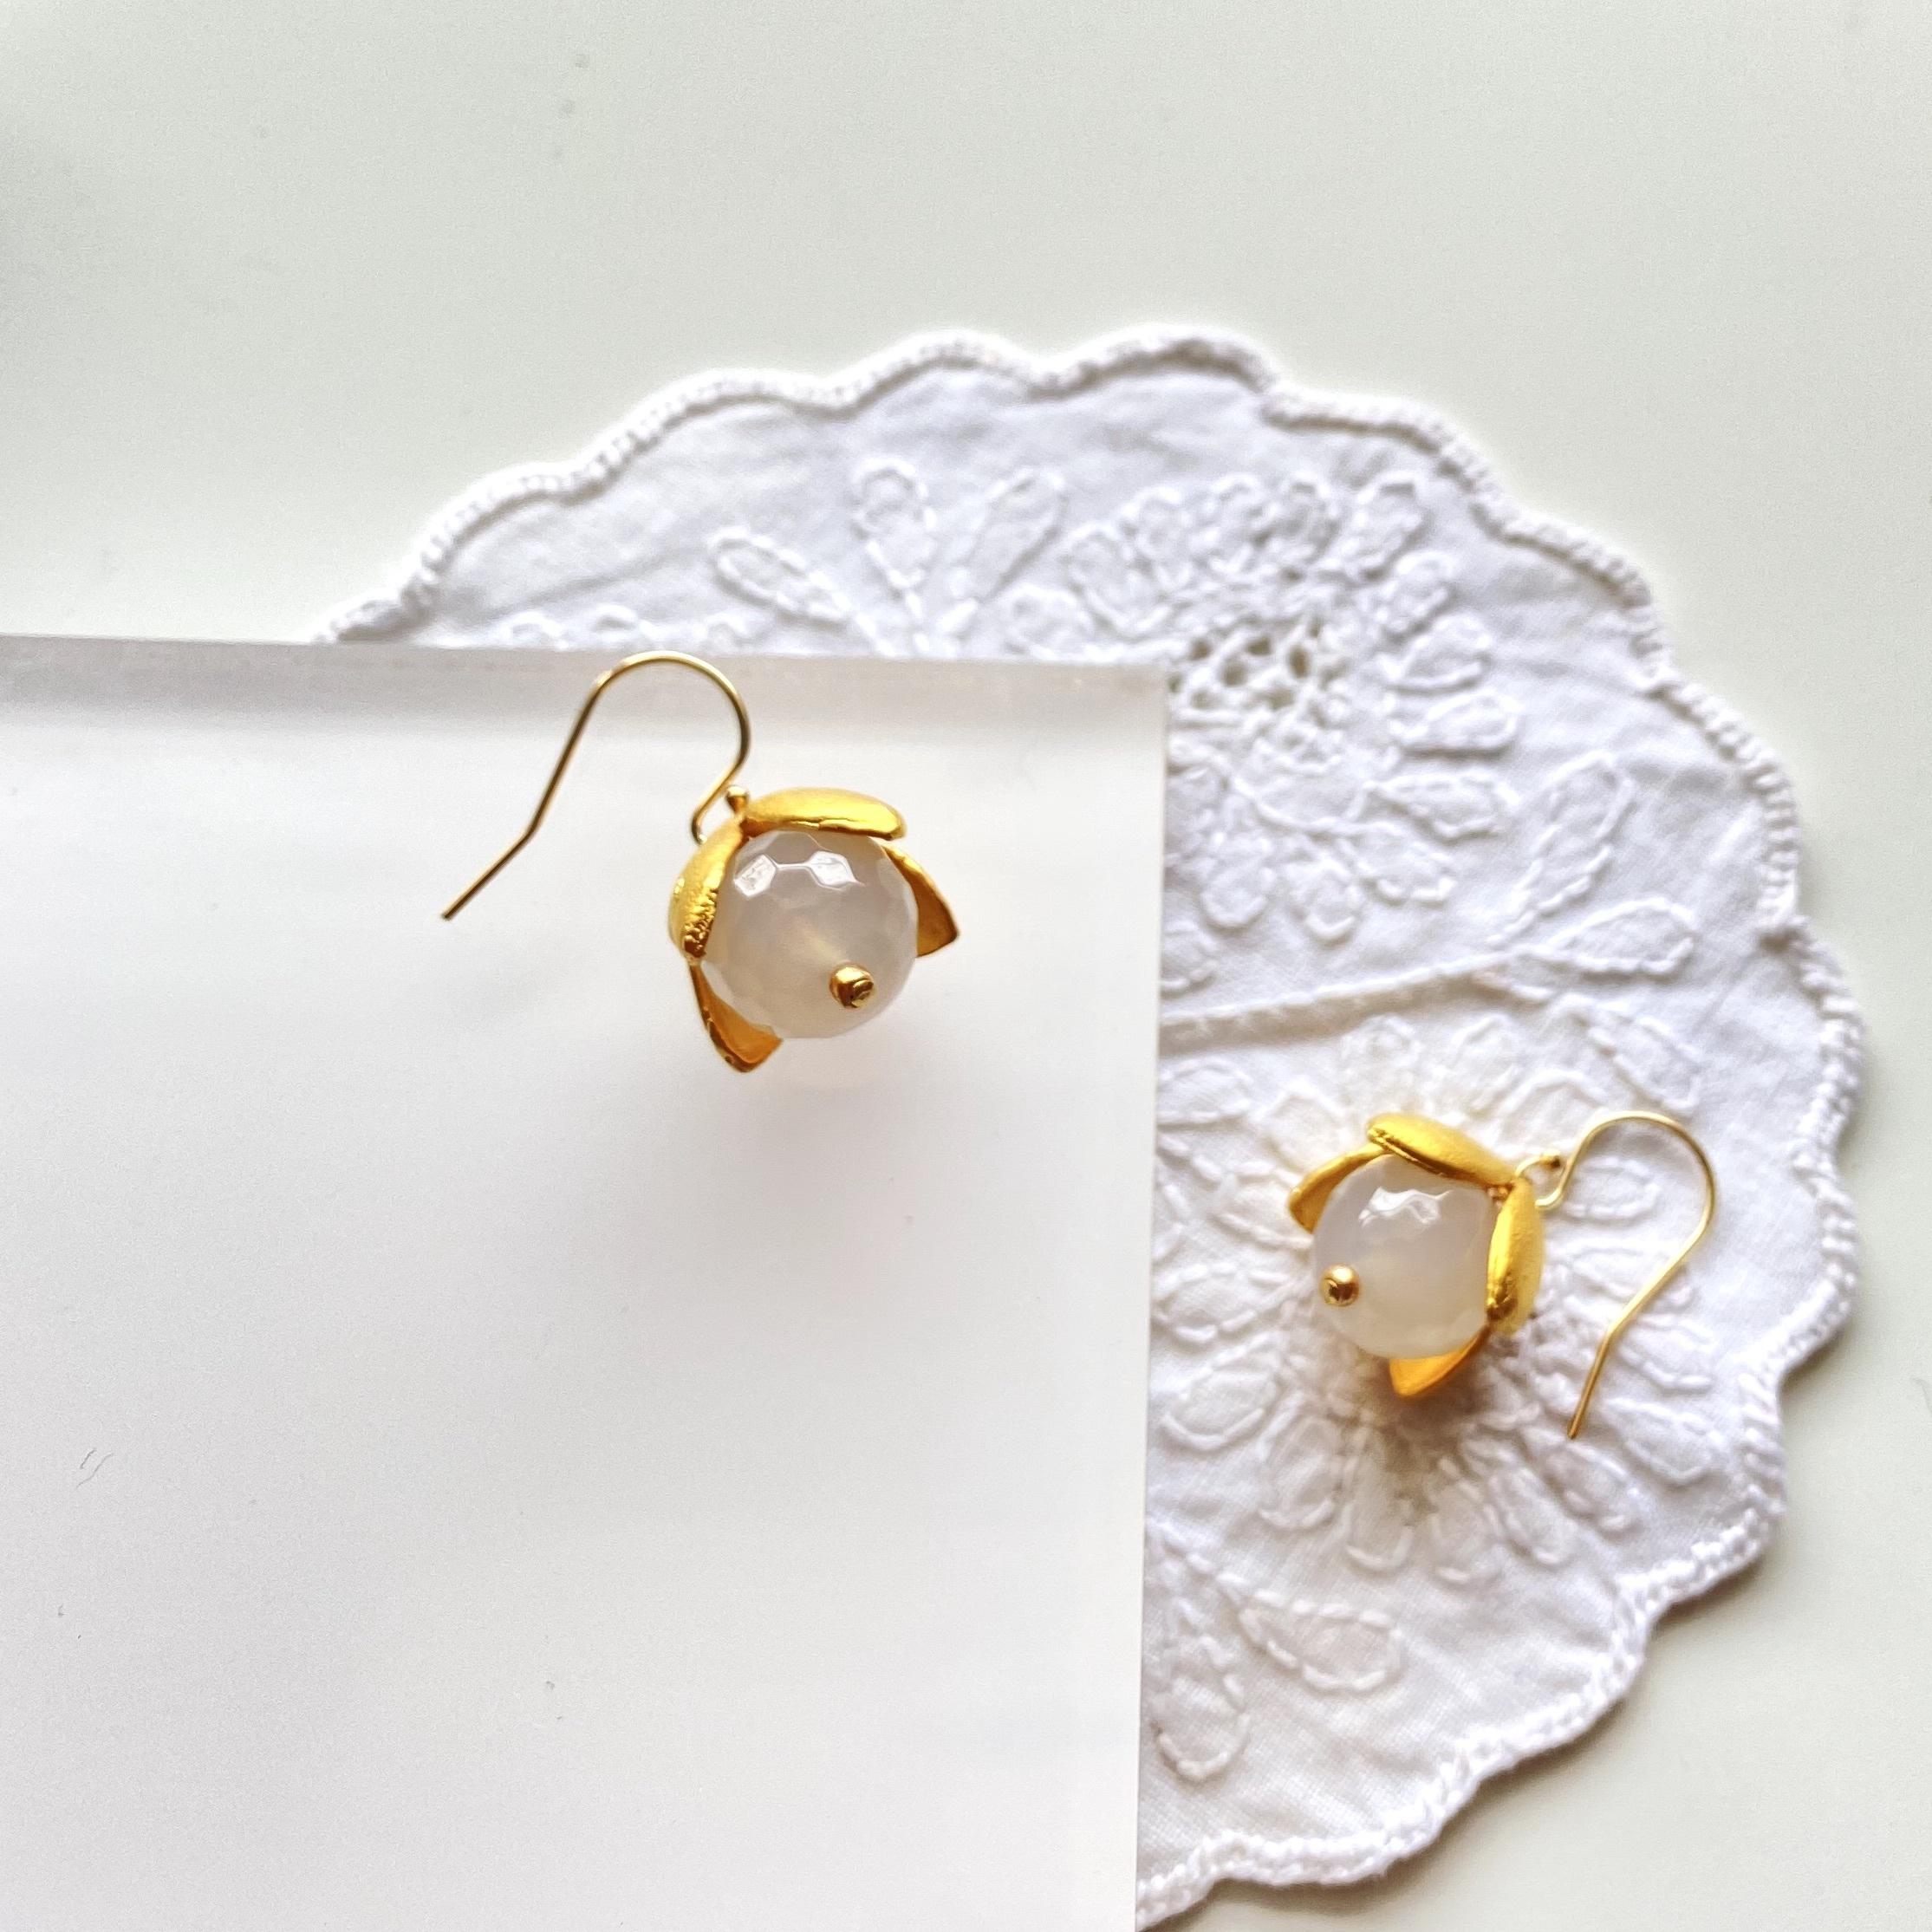 PUSHPA earrings